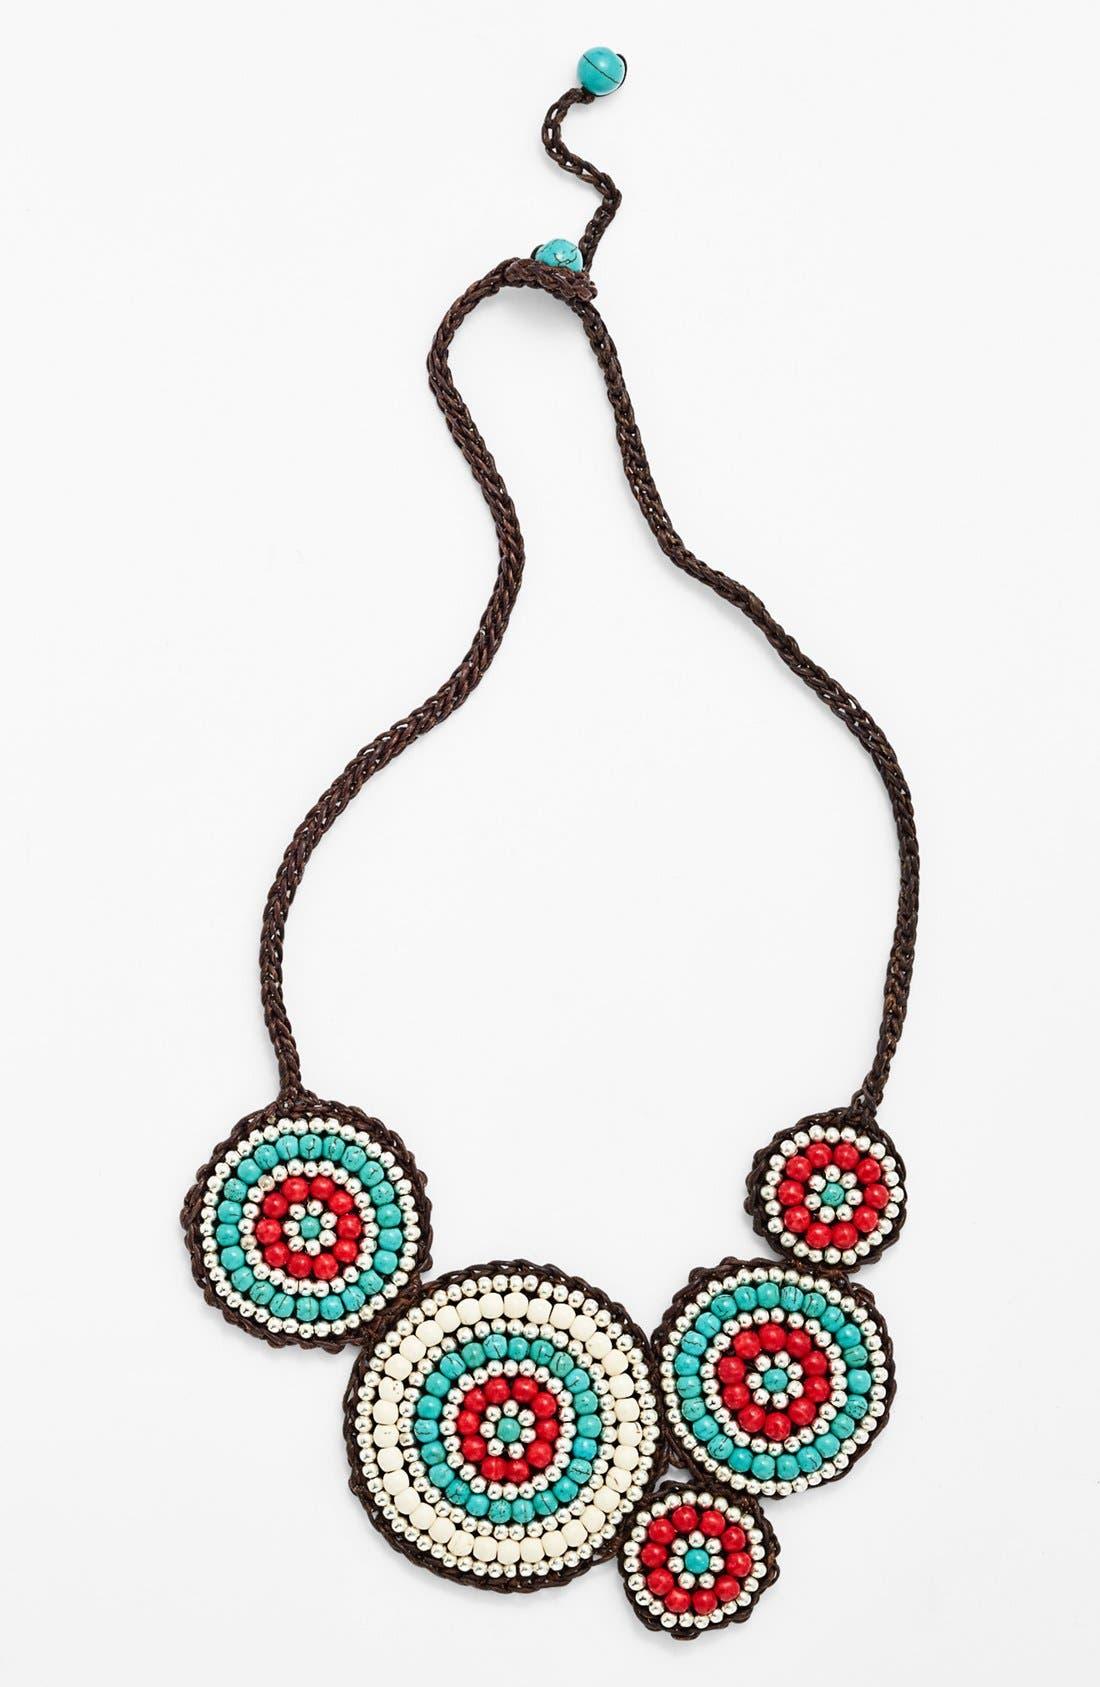 Alternate Image 1 Selected - Panacea Howlite Bib Necklace